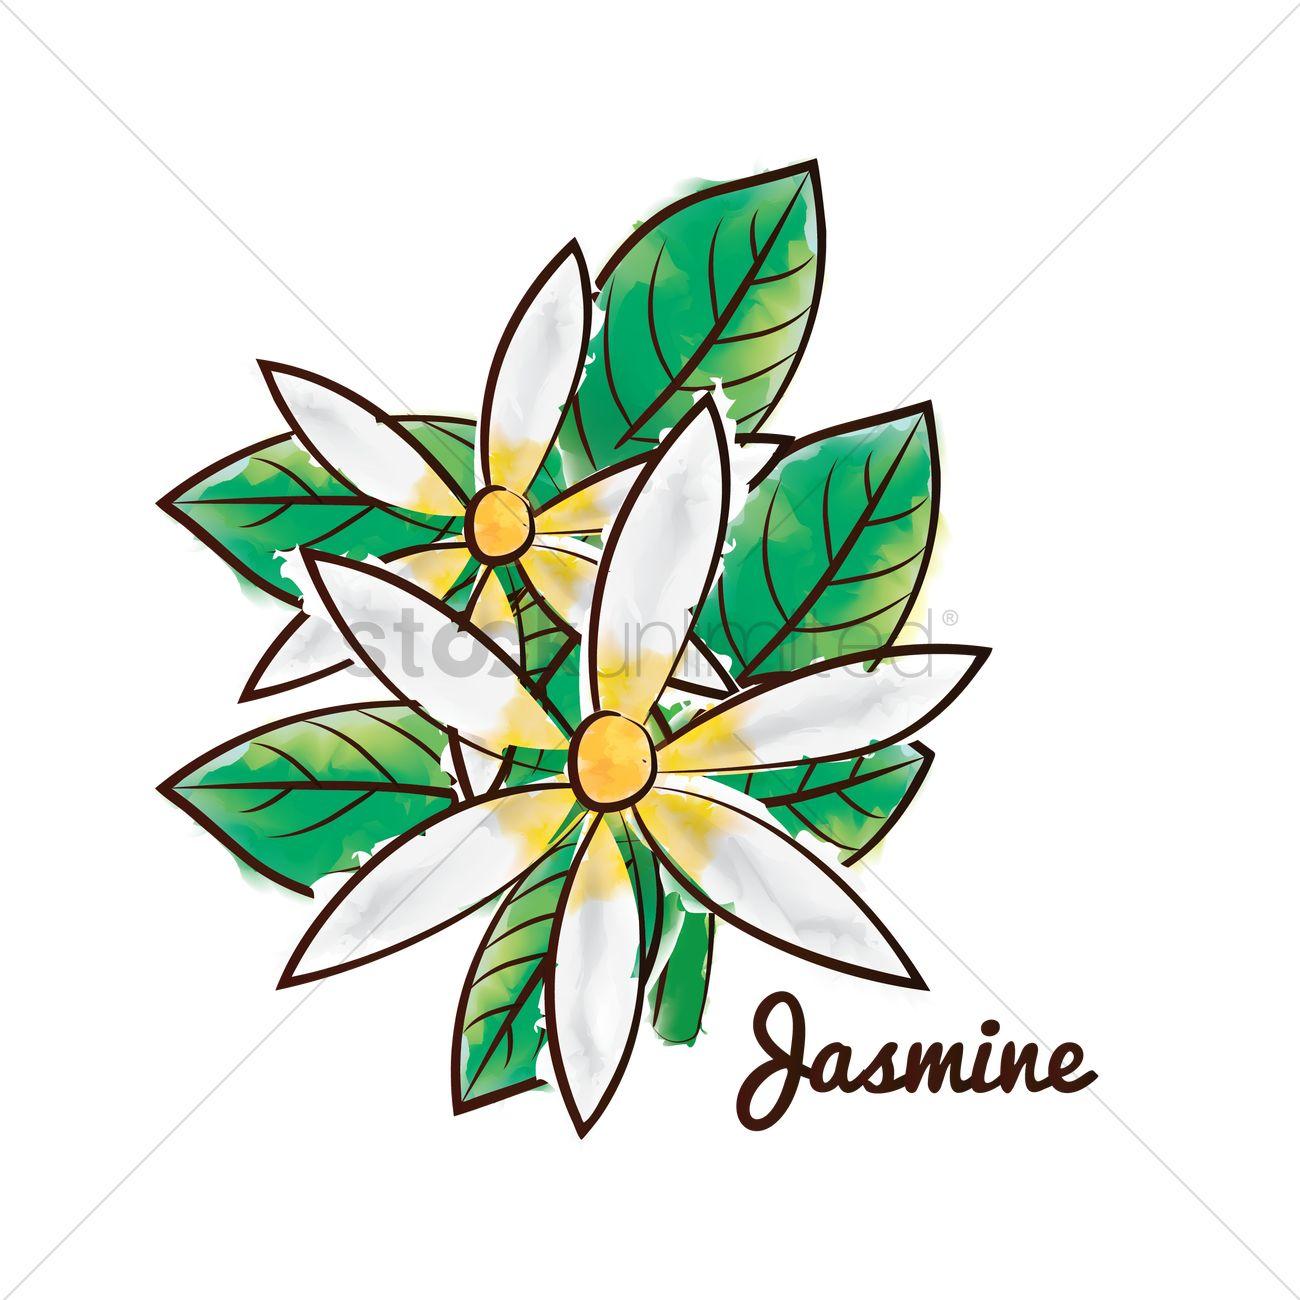 Jasmine Flower Vector Image 1611935 Stockunlimited